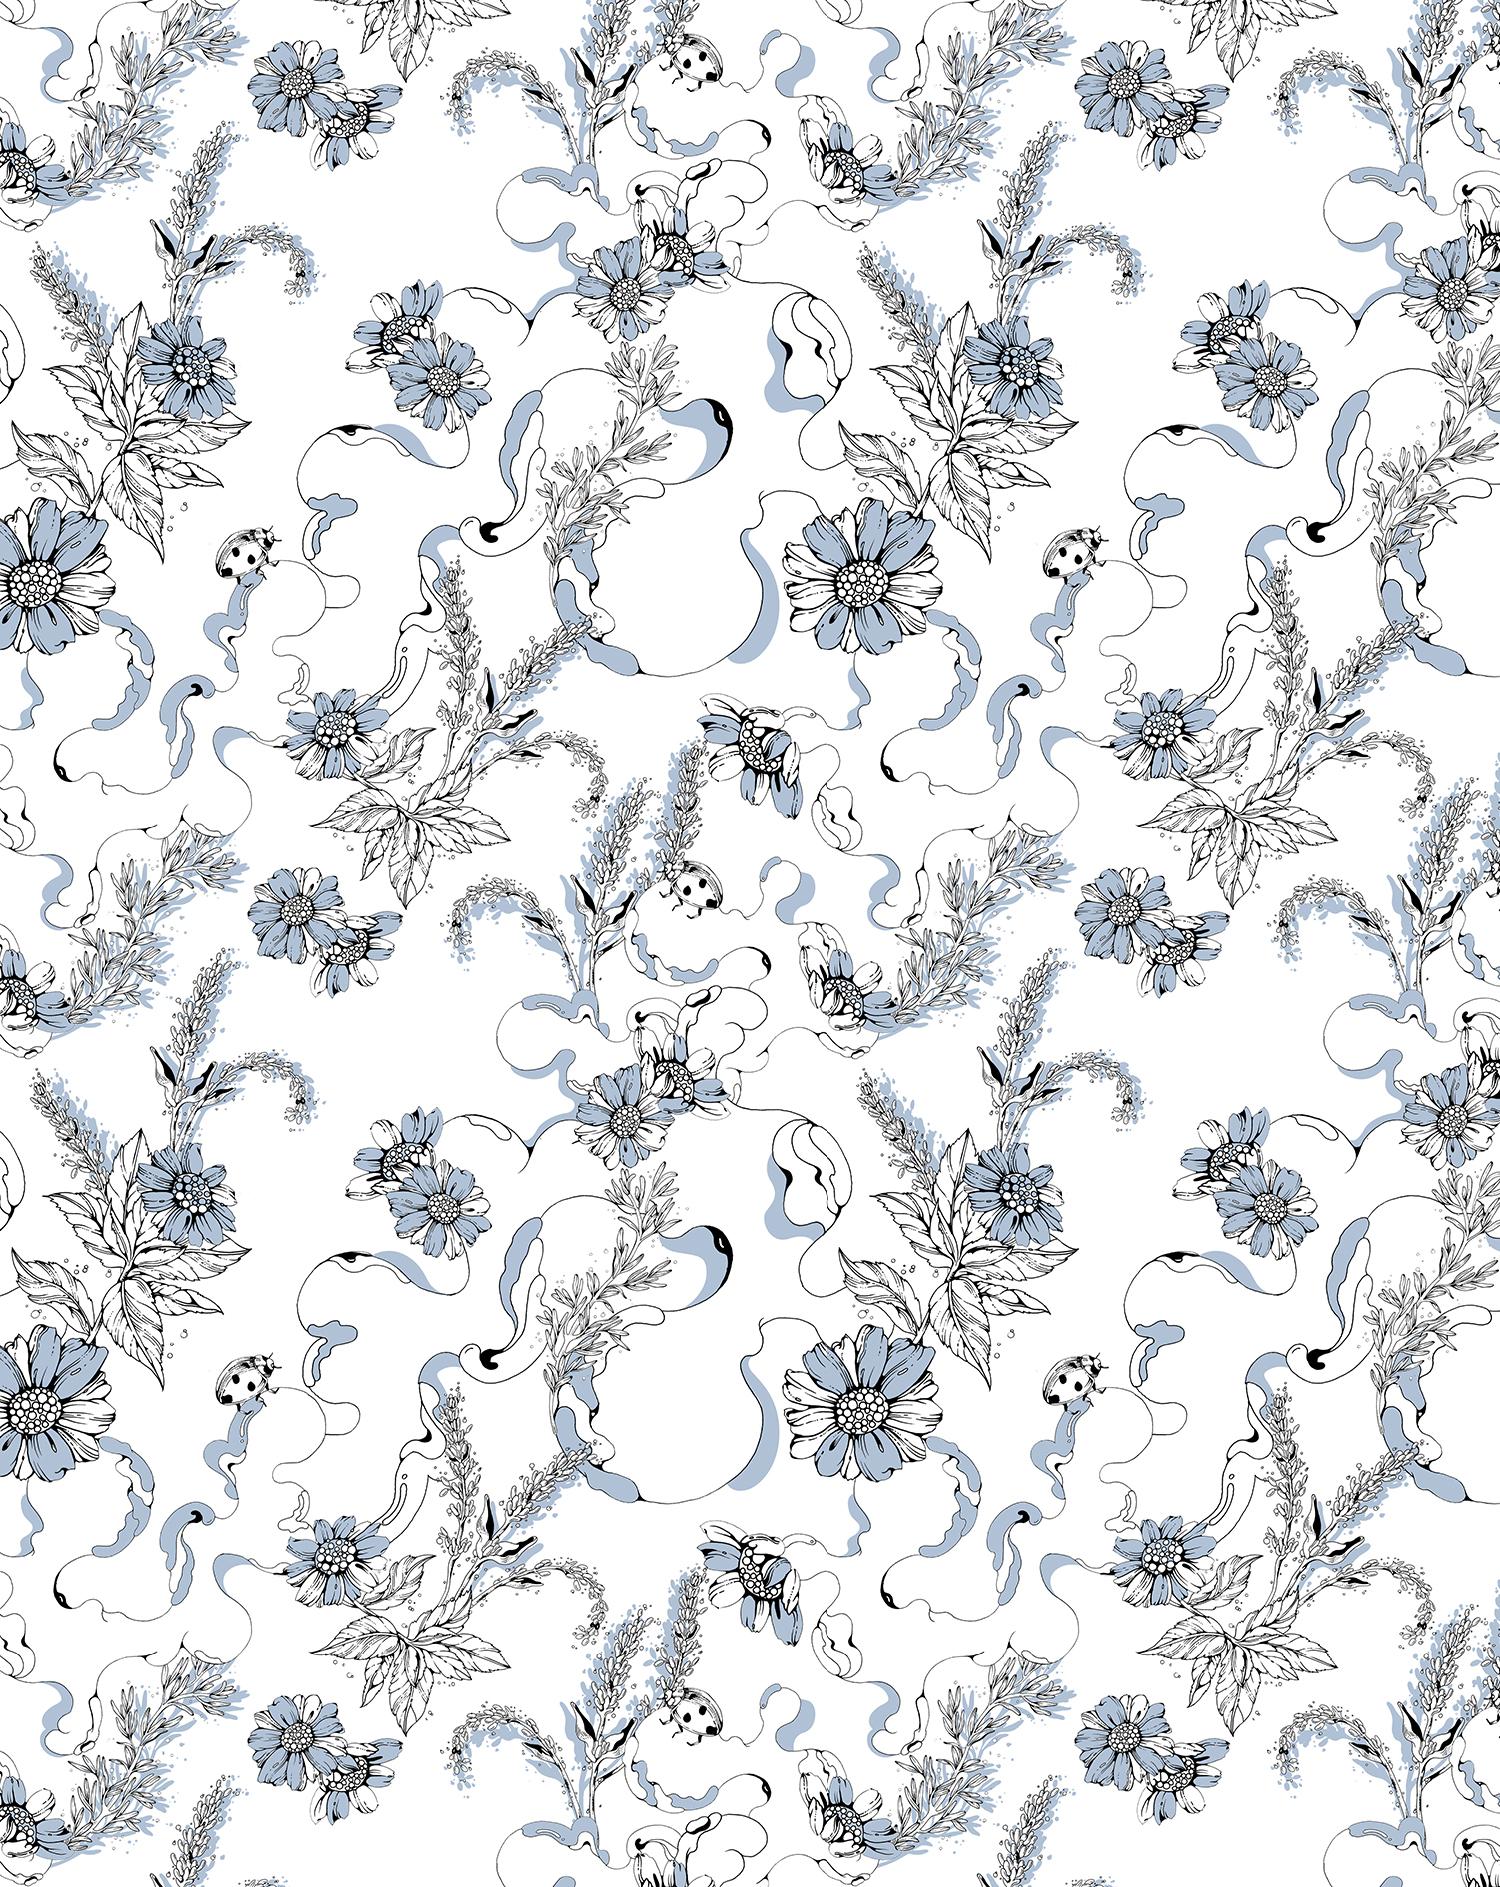 PommeChan_Sagitta_Pattern_Lowres_15x15.jpg